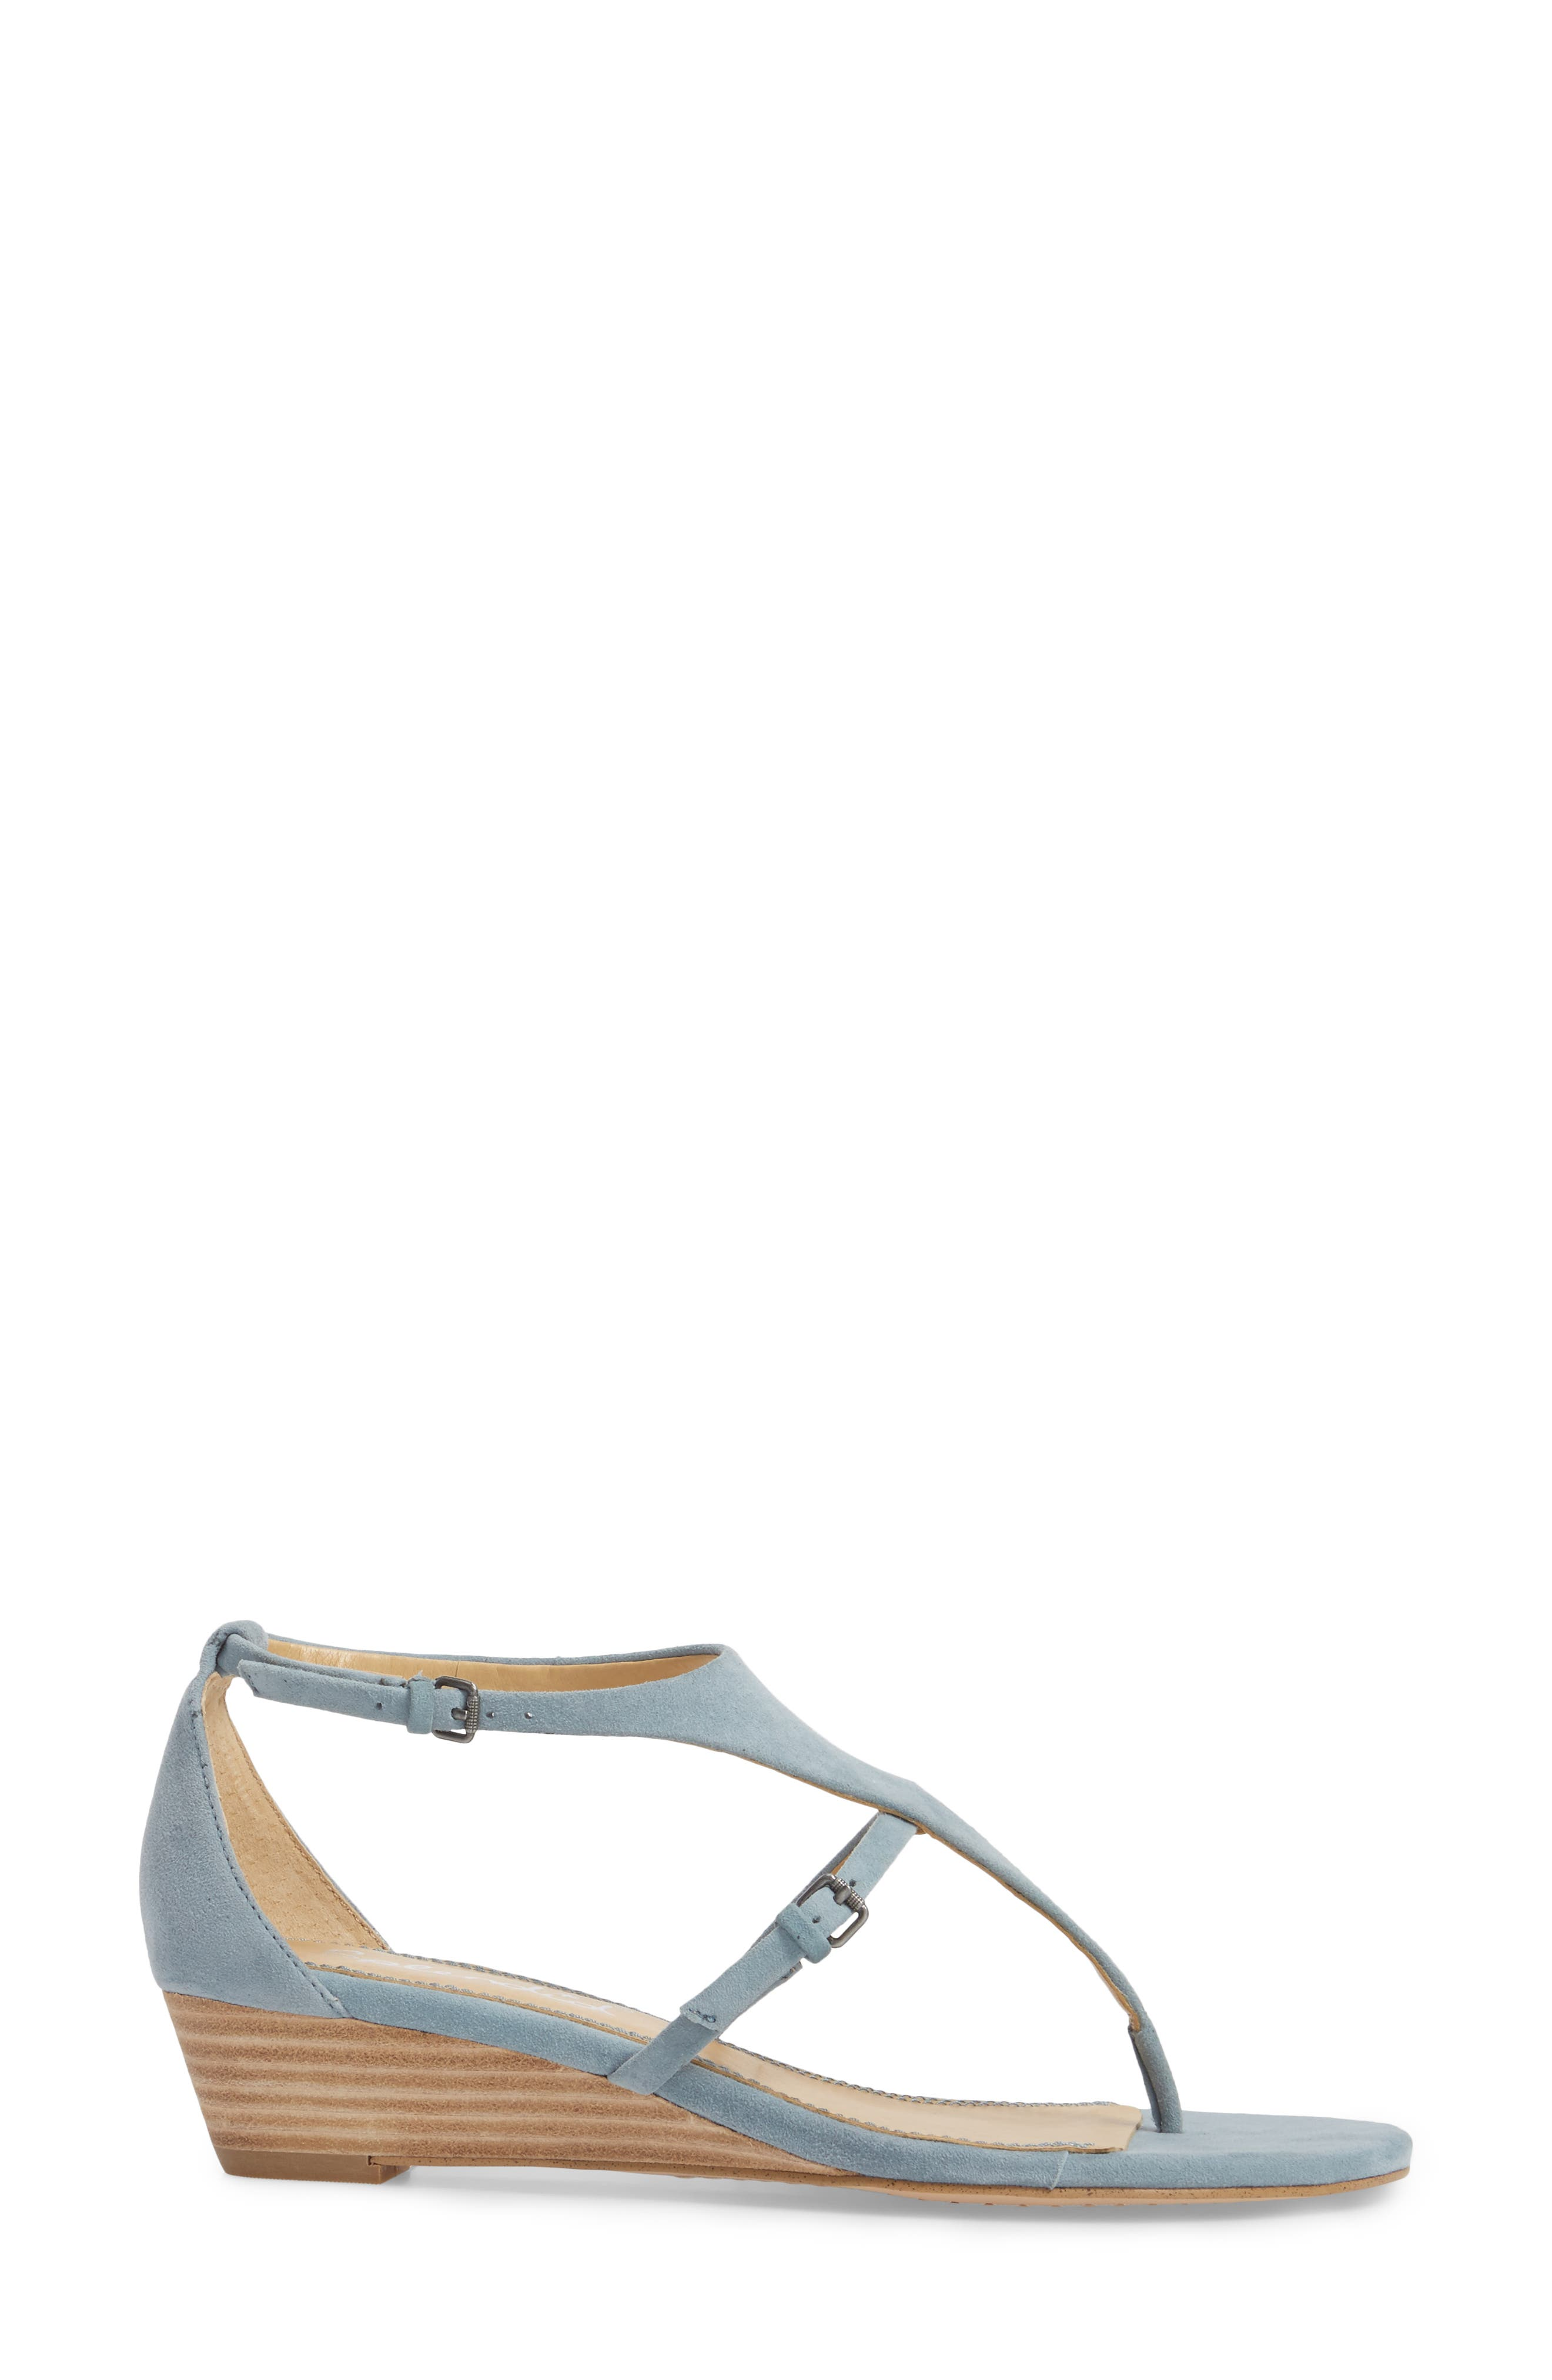 Brooklyn V-Strap Wedge Sandal,                             Alternate thumbnail 12, color,